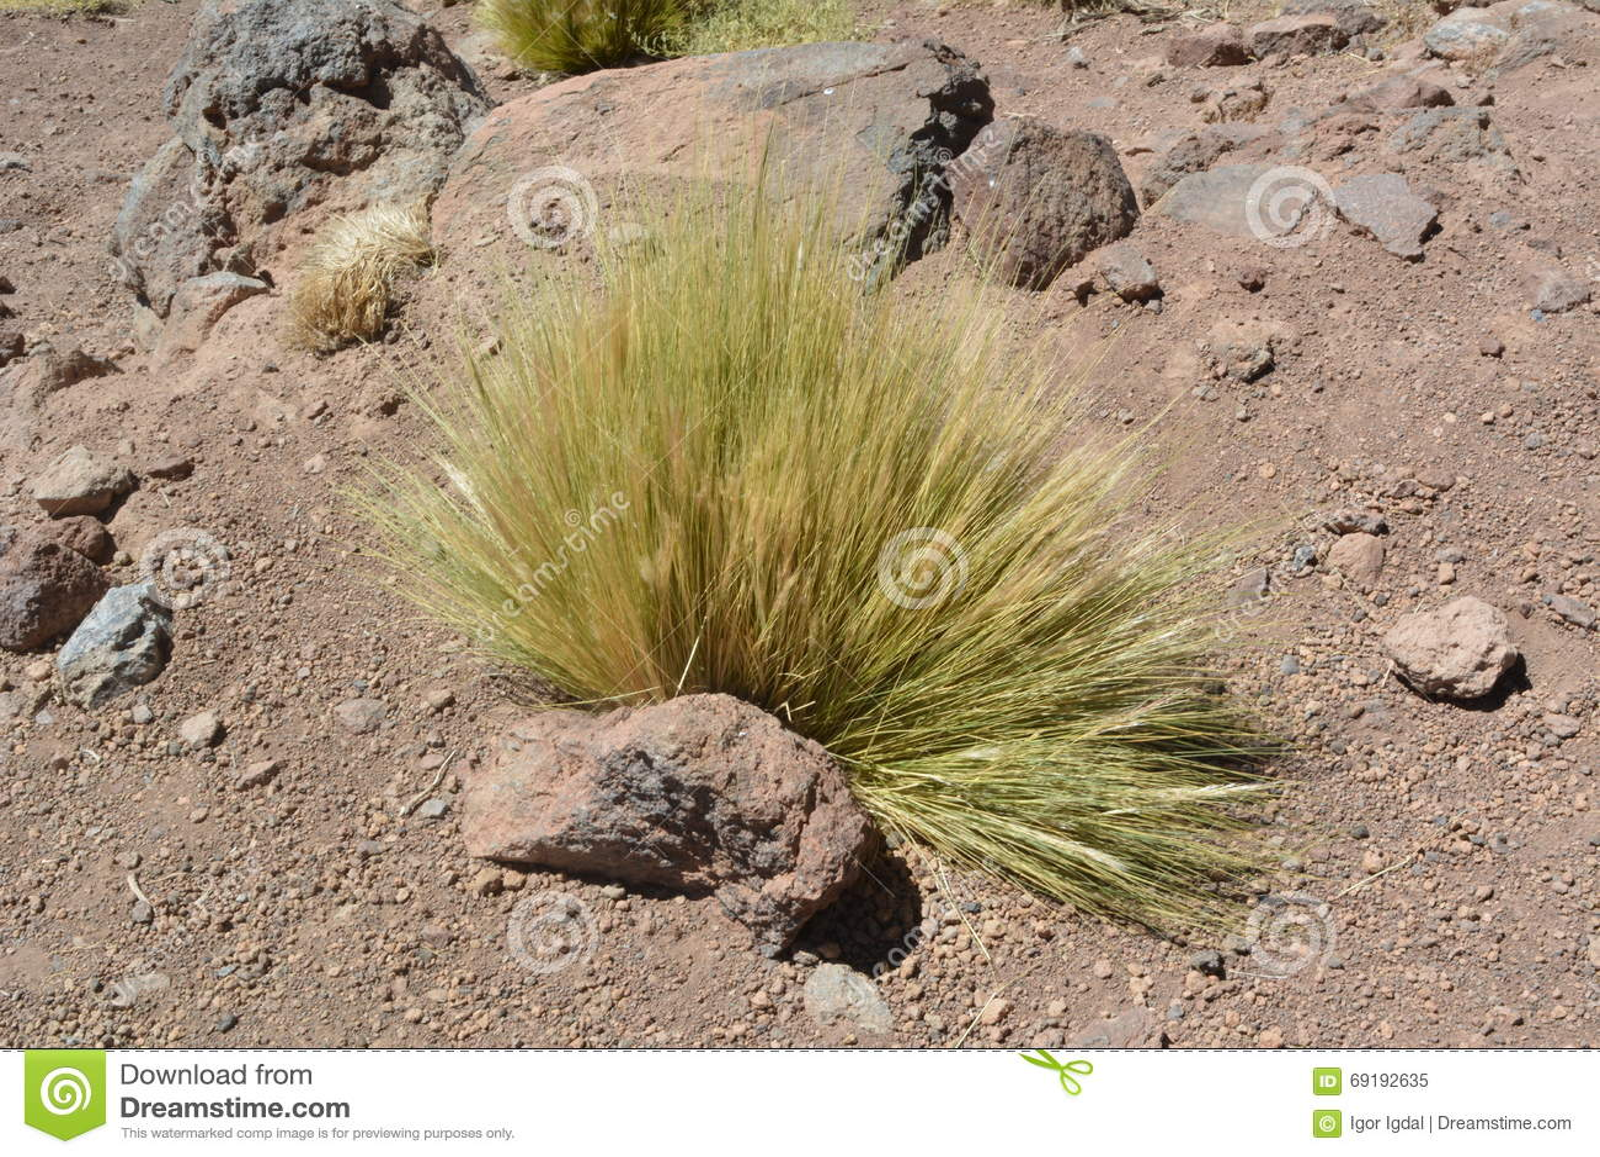 Chile. Desert Plant - Paja Brava Stock Photo - Image: 69192635